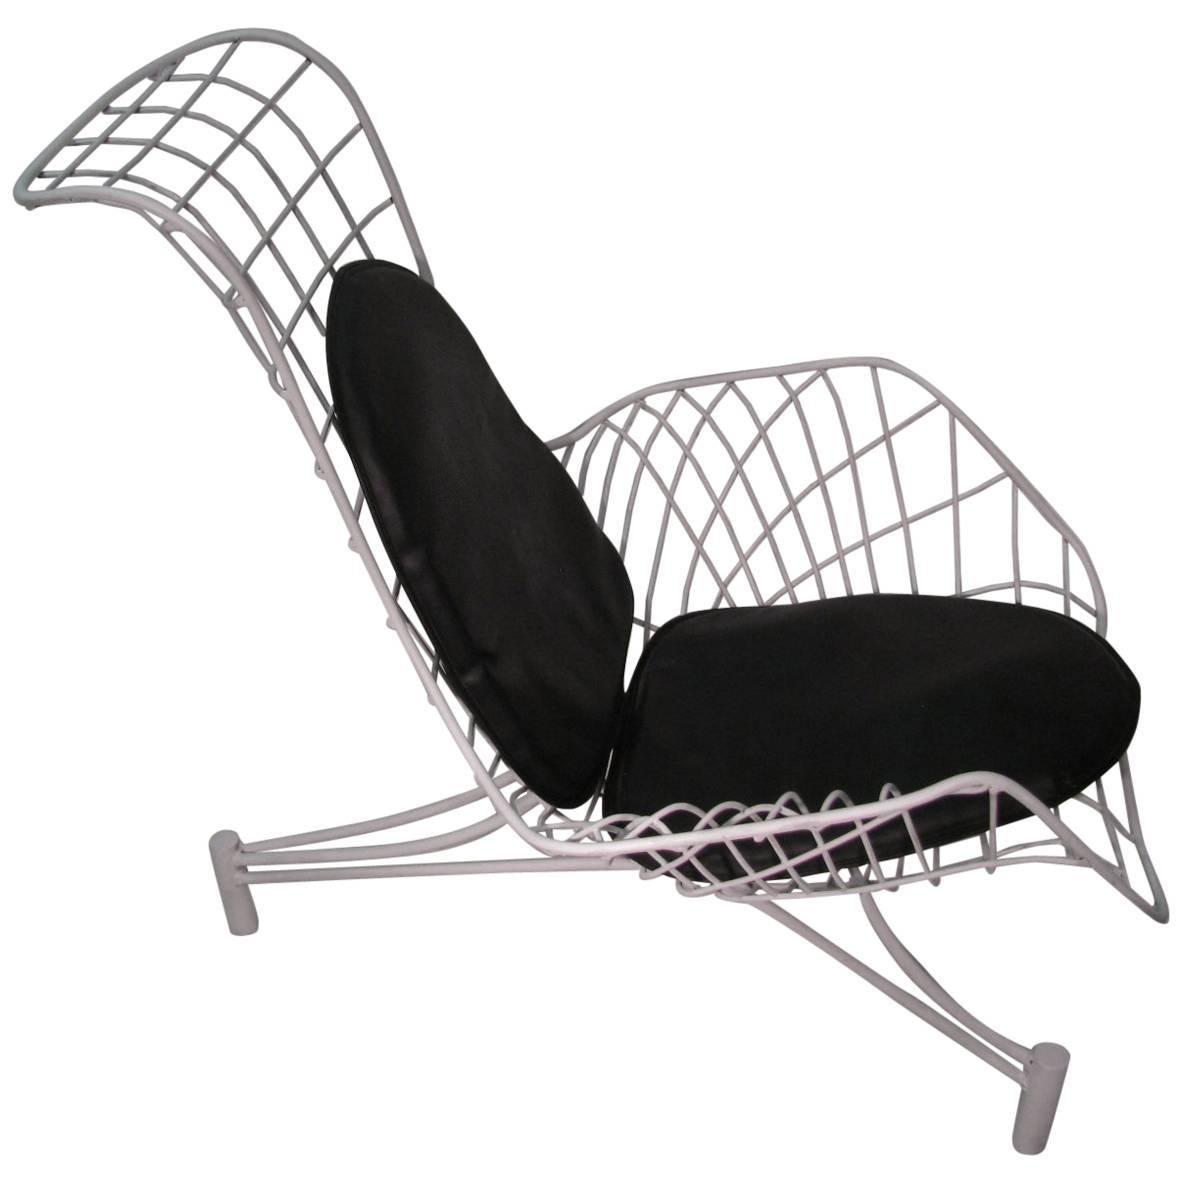 Vladimir Kagan Mid-Century Modern Lounge Chair Recliner with Original Pads